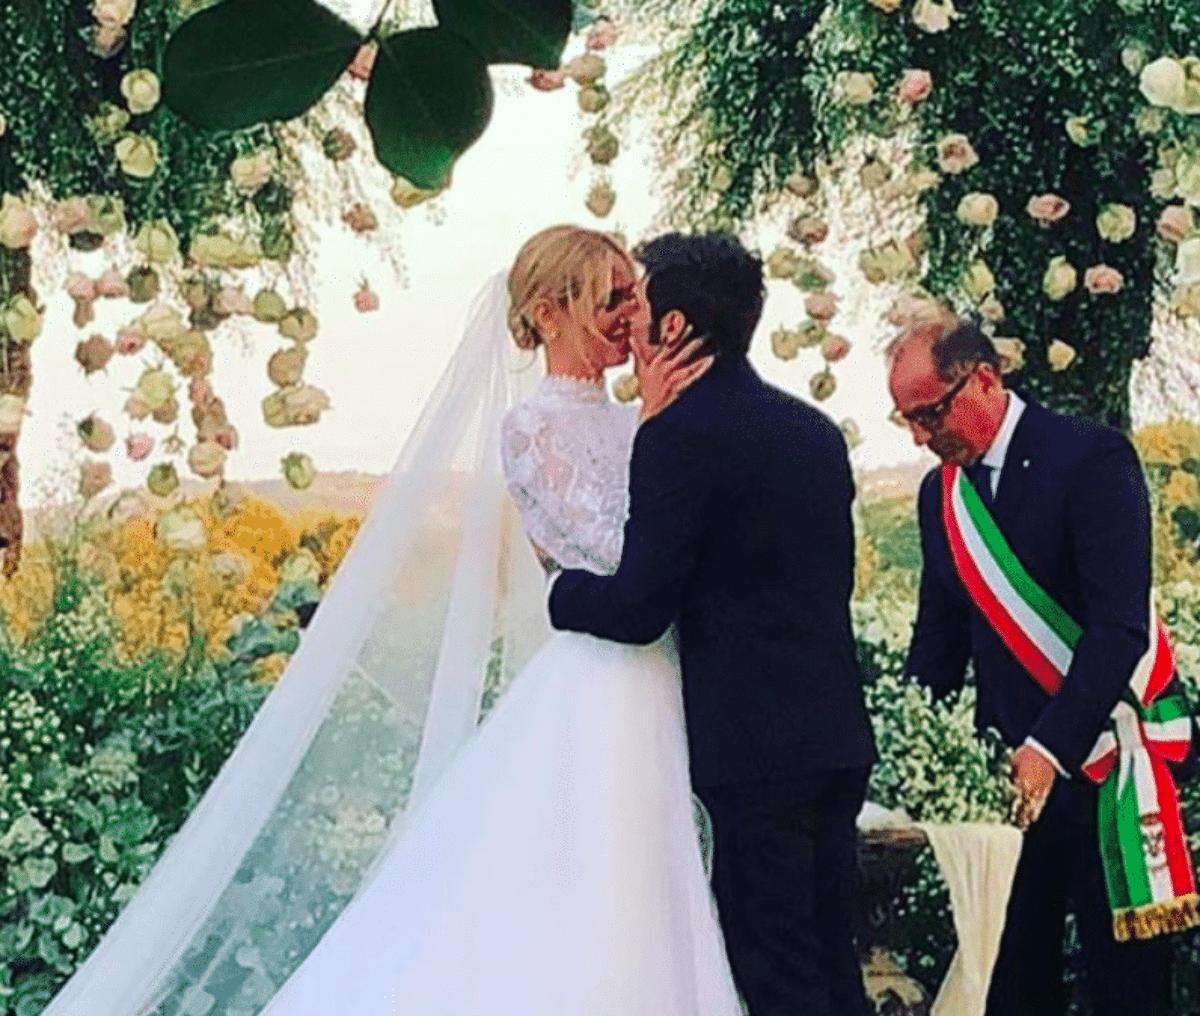 ca612aee3ed8 Matrimonio Chiara Ferragni e Fedez